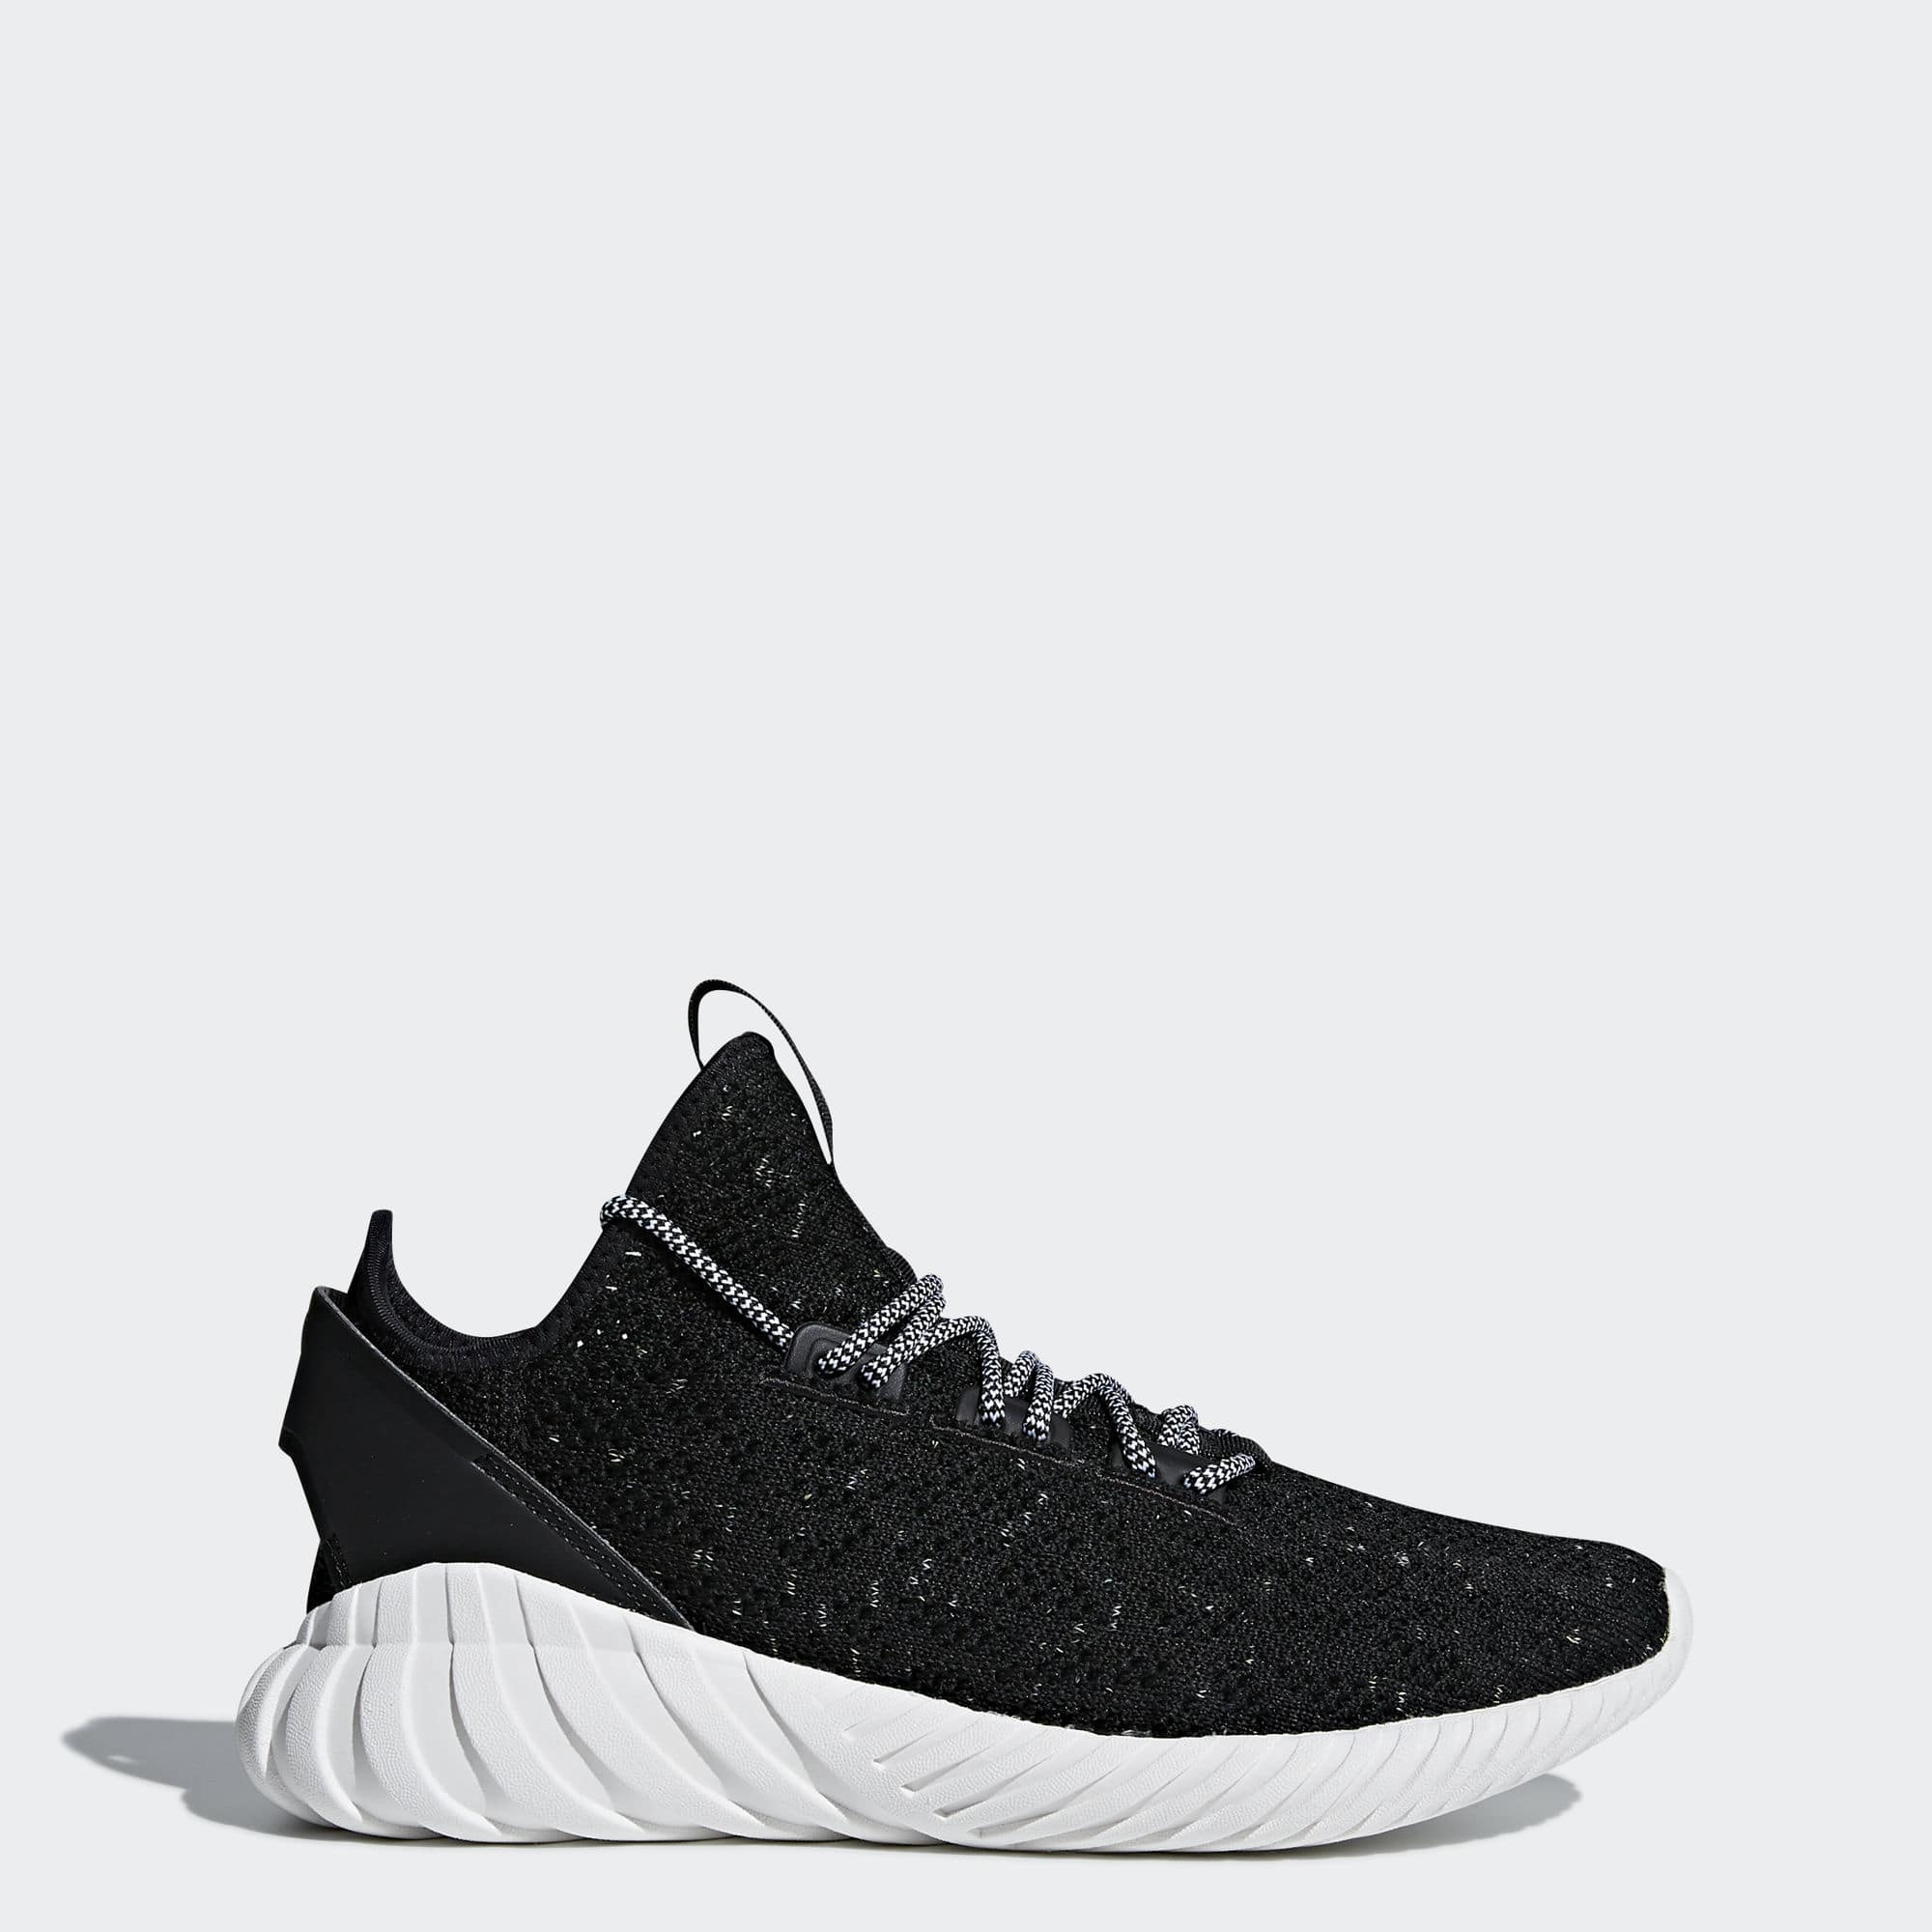 a809b8c78a4b adidas Men s Tubular Doom Primeknit Shoes for  47.99 on eBay ...